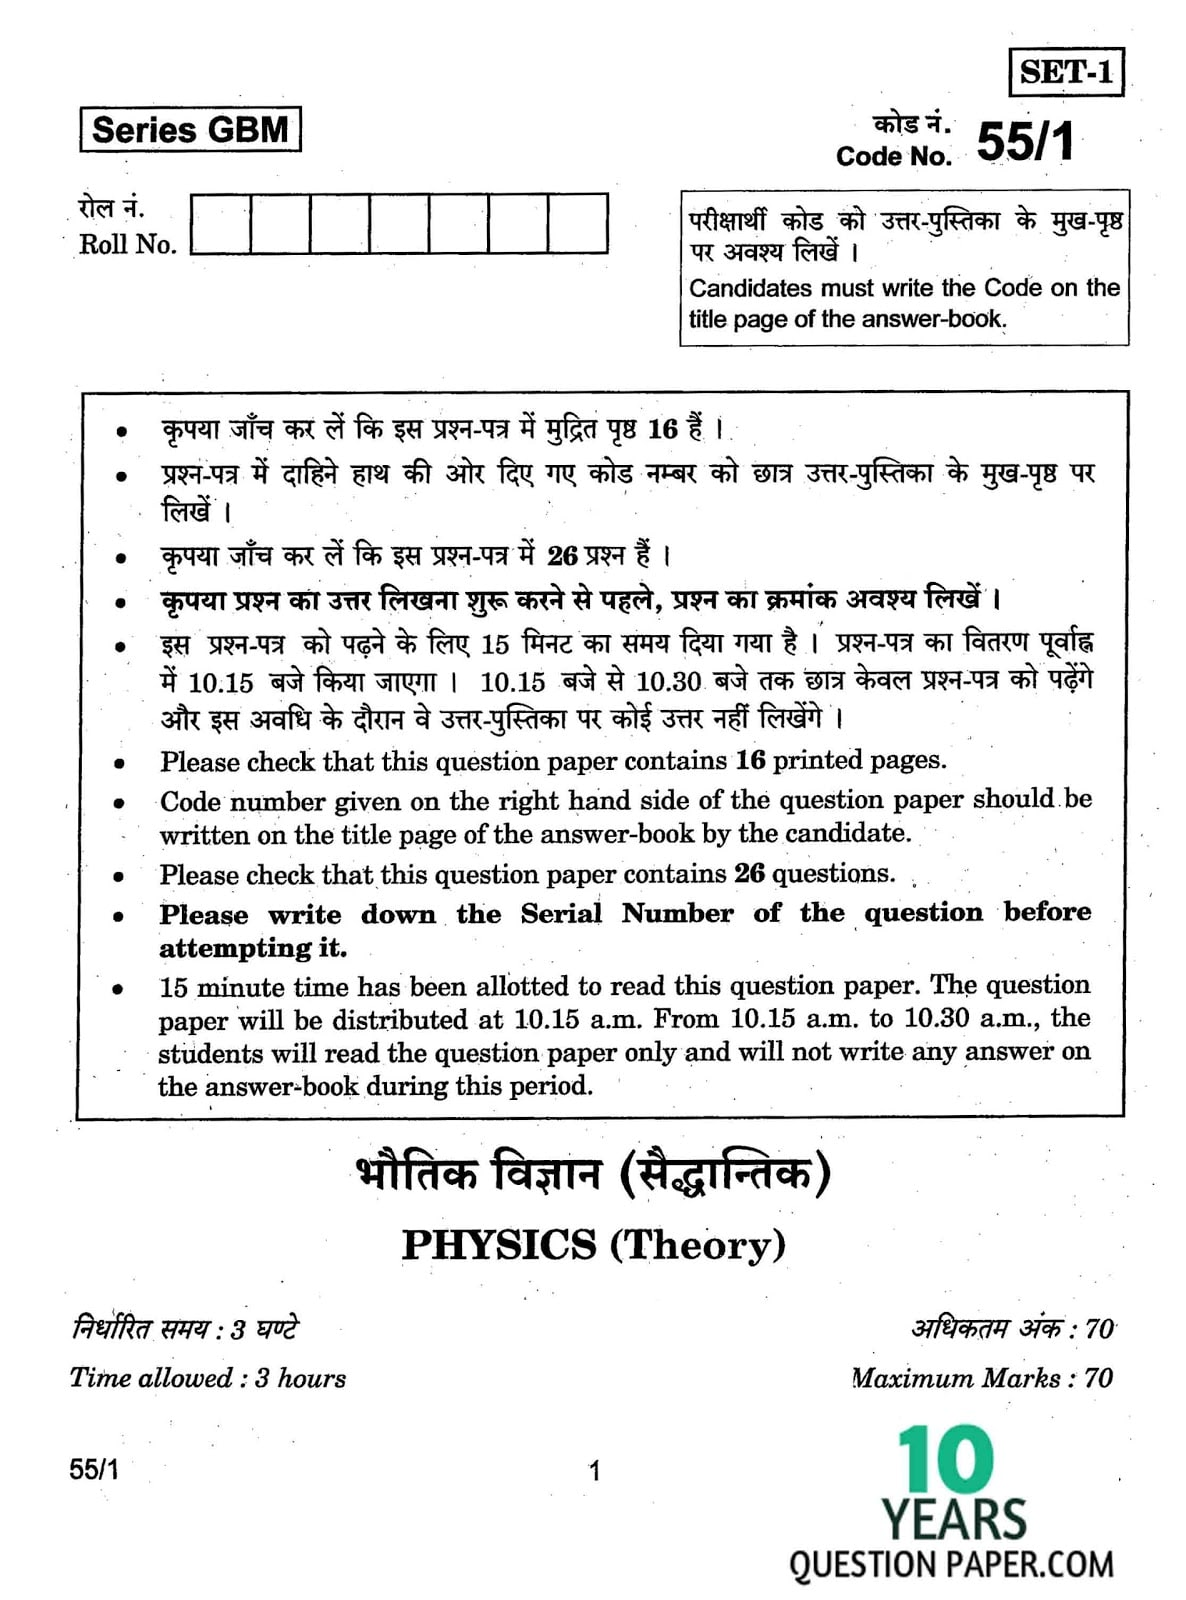 CBSE Class 12 Physics 2017 Question Paper